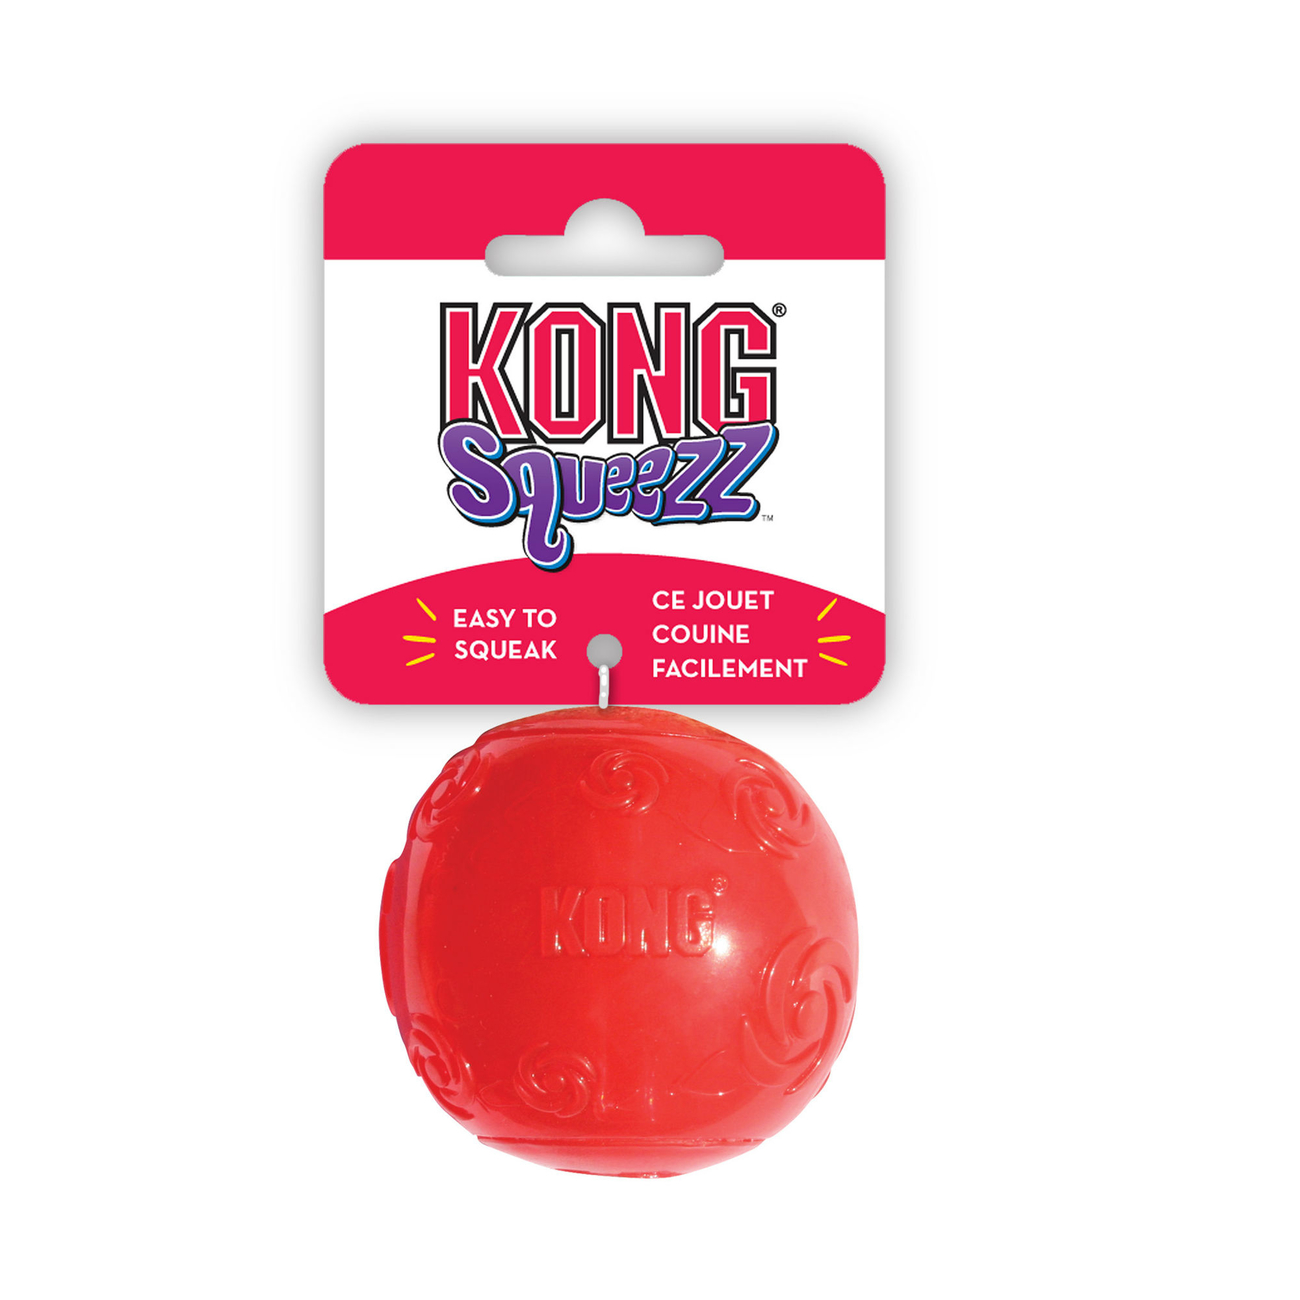 KONG Squeezz Ball Hundespielzeug, Bild 2